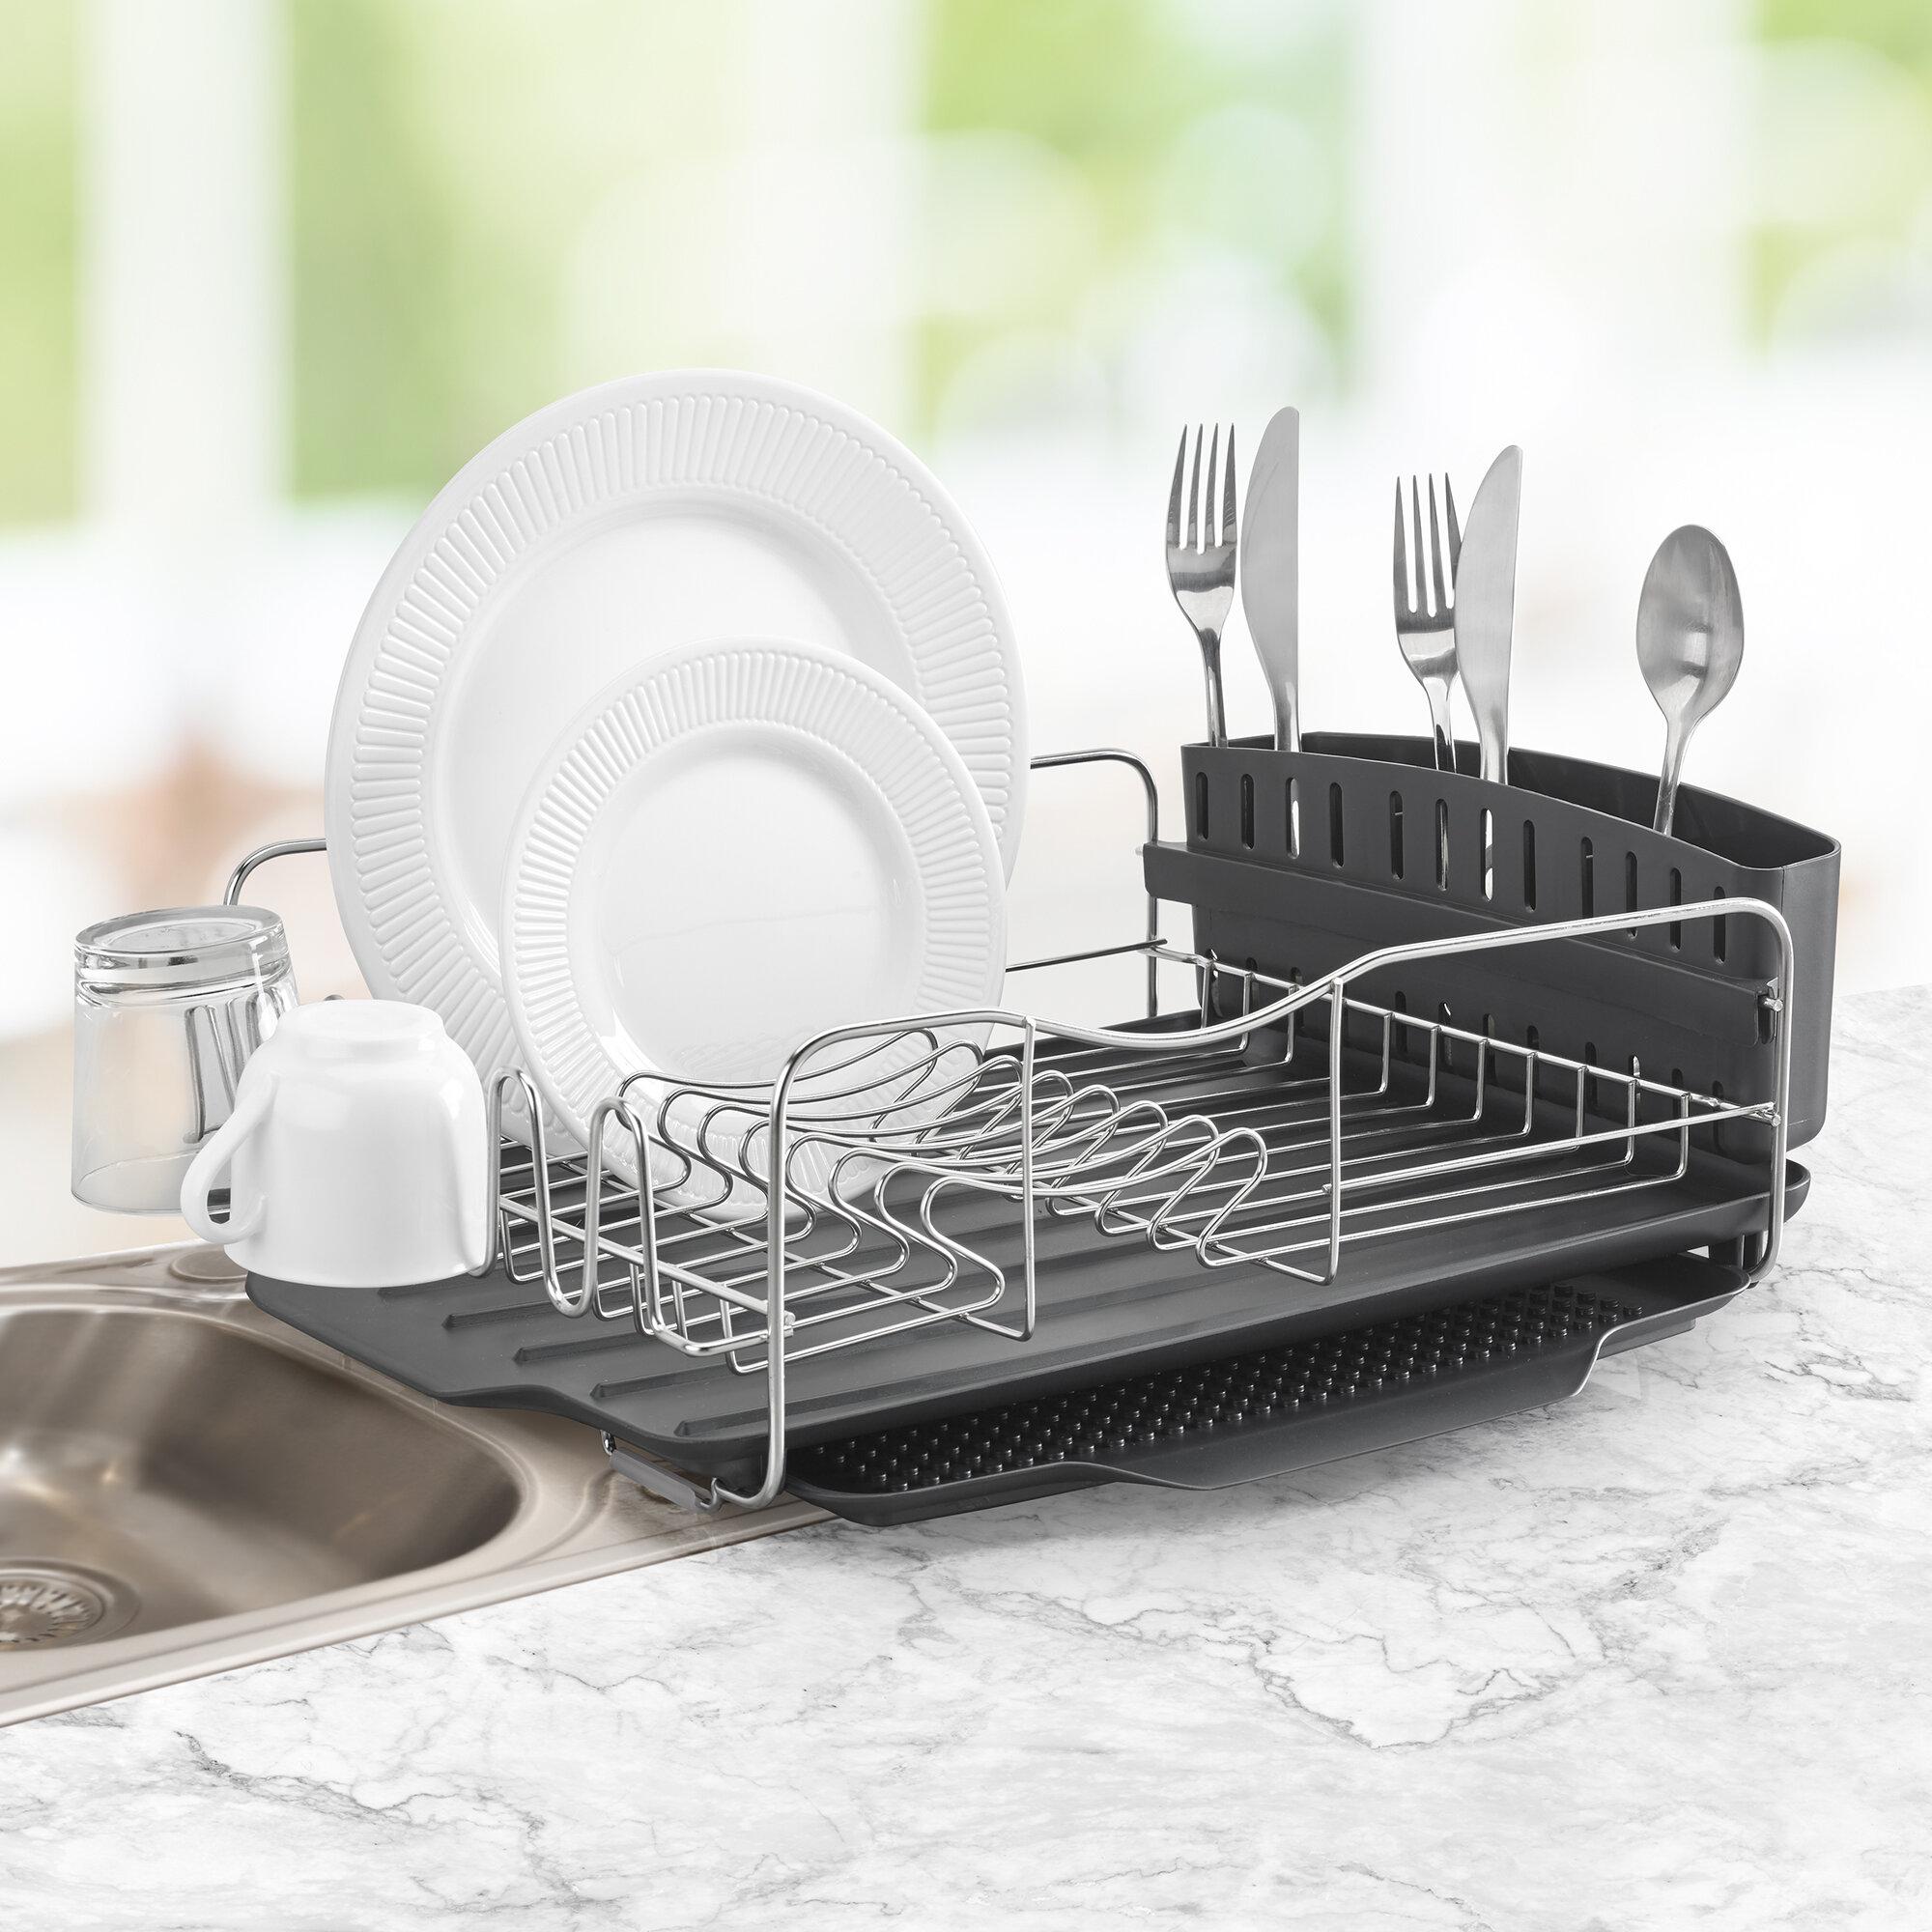 Polder Products Llc Advantage Dish Rack Reviews Wayfair